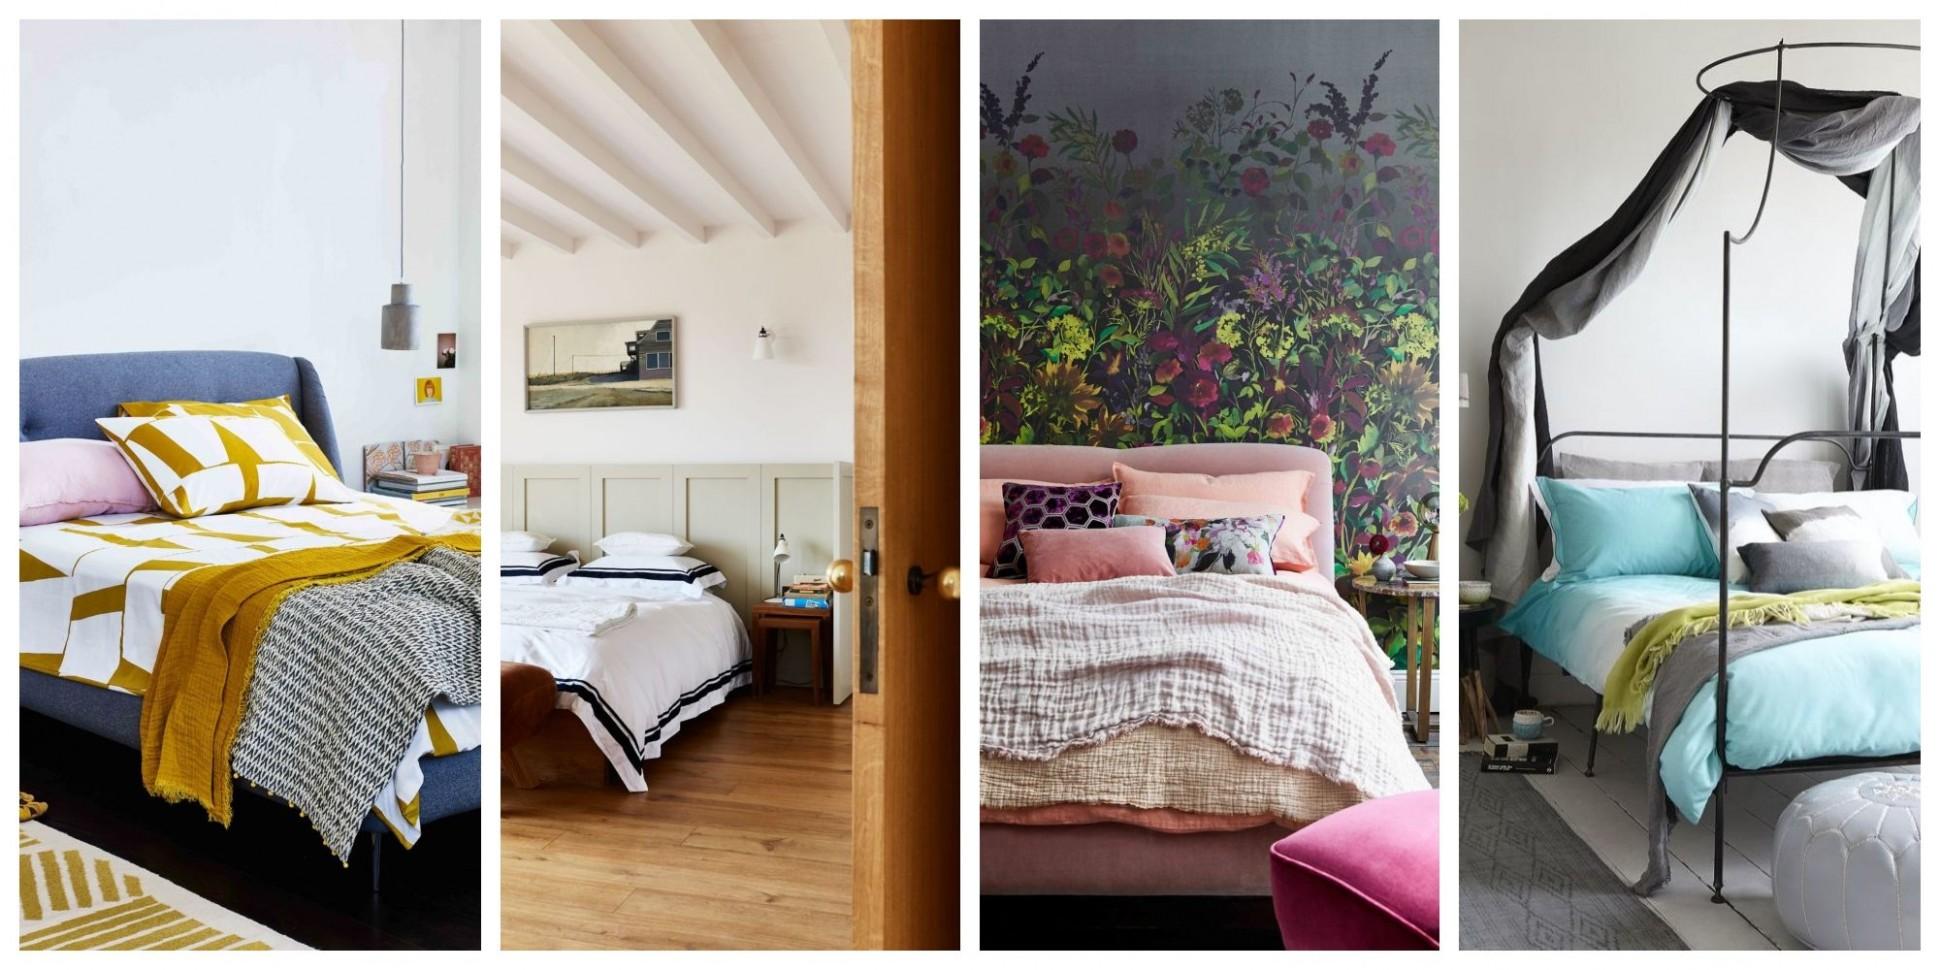 10 Beautiful Bedroom Decorating Ideas - Modern Bedroom Ideas - Bedroom Ideas Uk